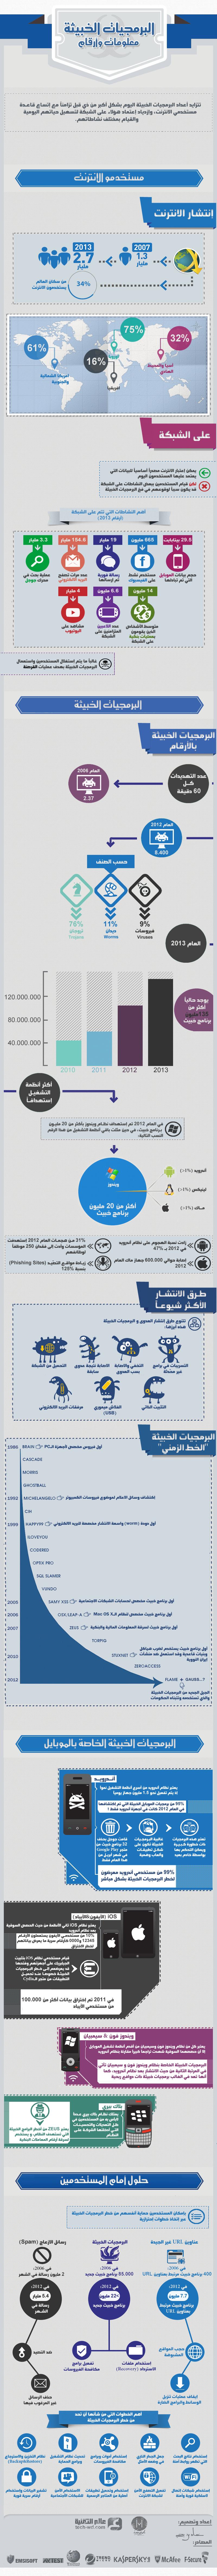 infographic-malware tech wd&imad